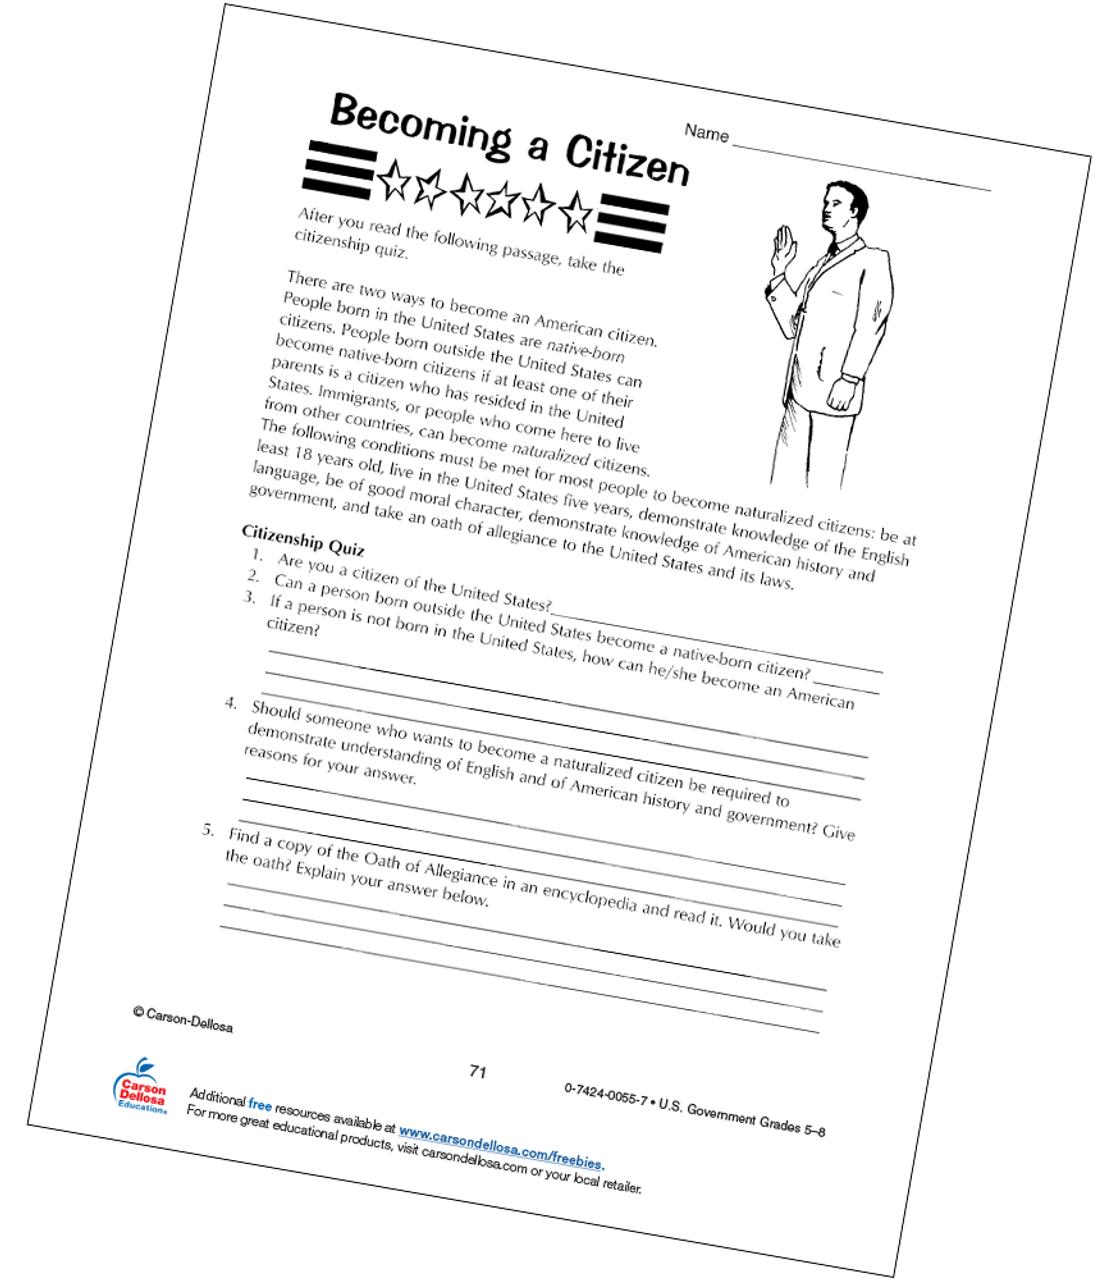 hight resolution of Becoming a U.S. Citizen Grades 5-8 Free Printable   Carson Dellosa